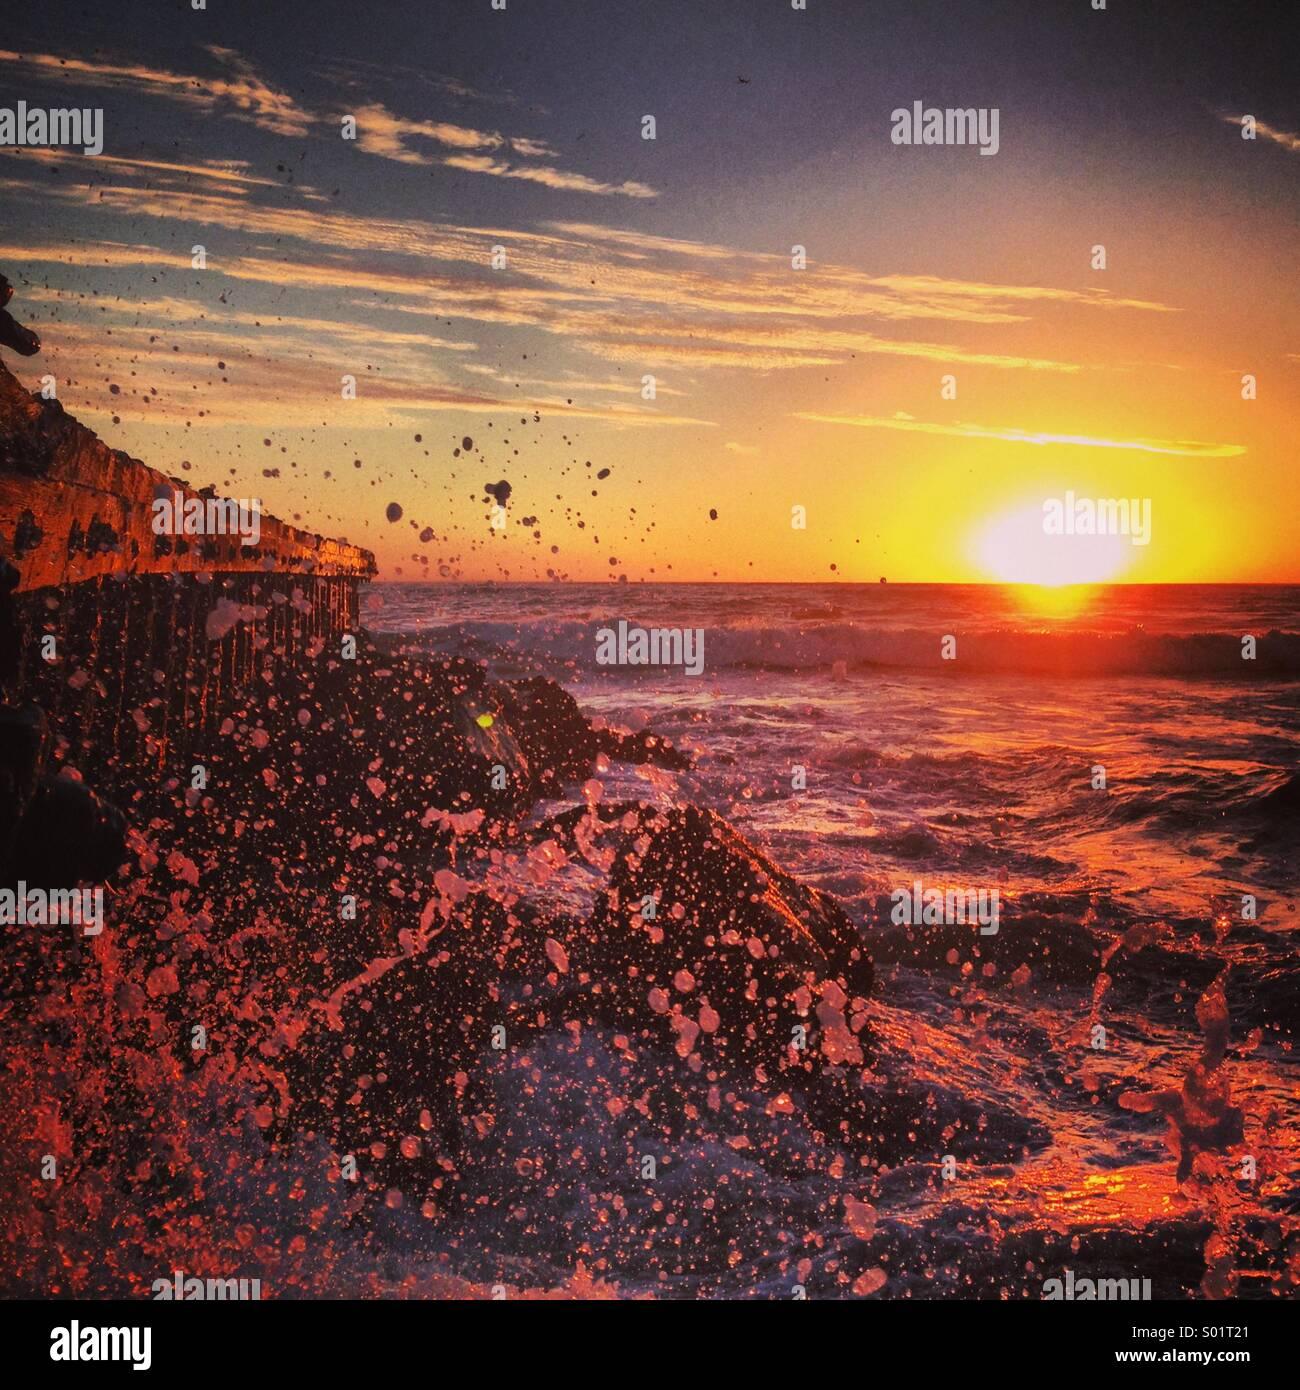 Huge wave crashing onto rocks during sunset. - Stock Image